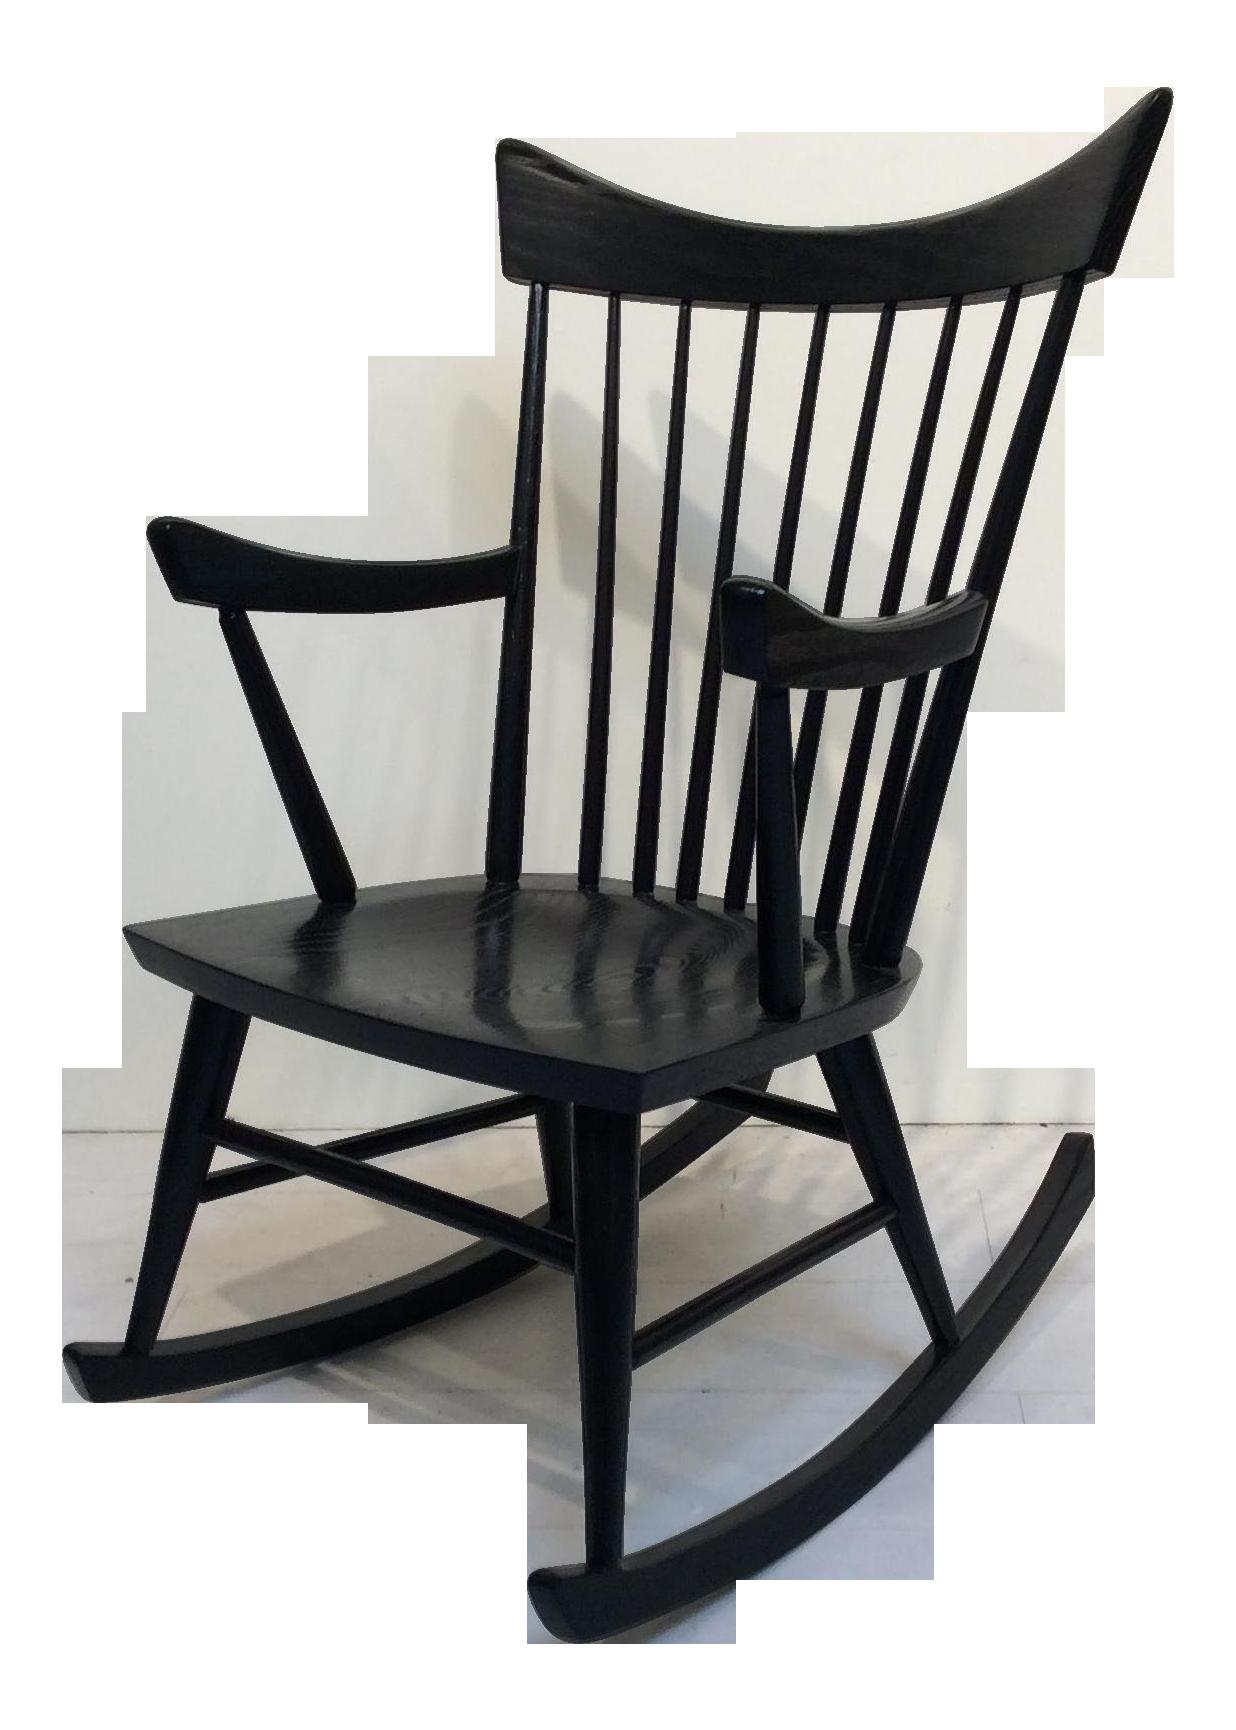 Picture of: Mid Century Modern Edmond Spence Style Black Rocking Chair Chairish